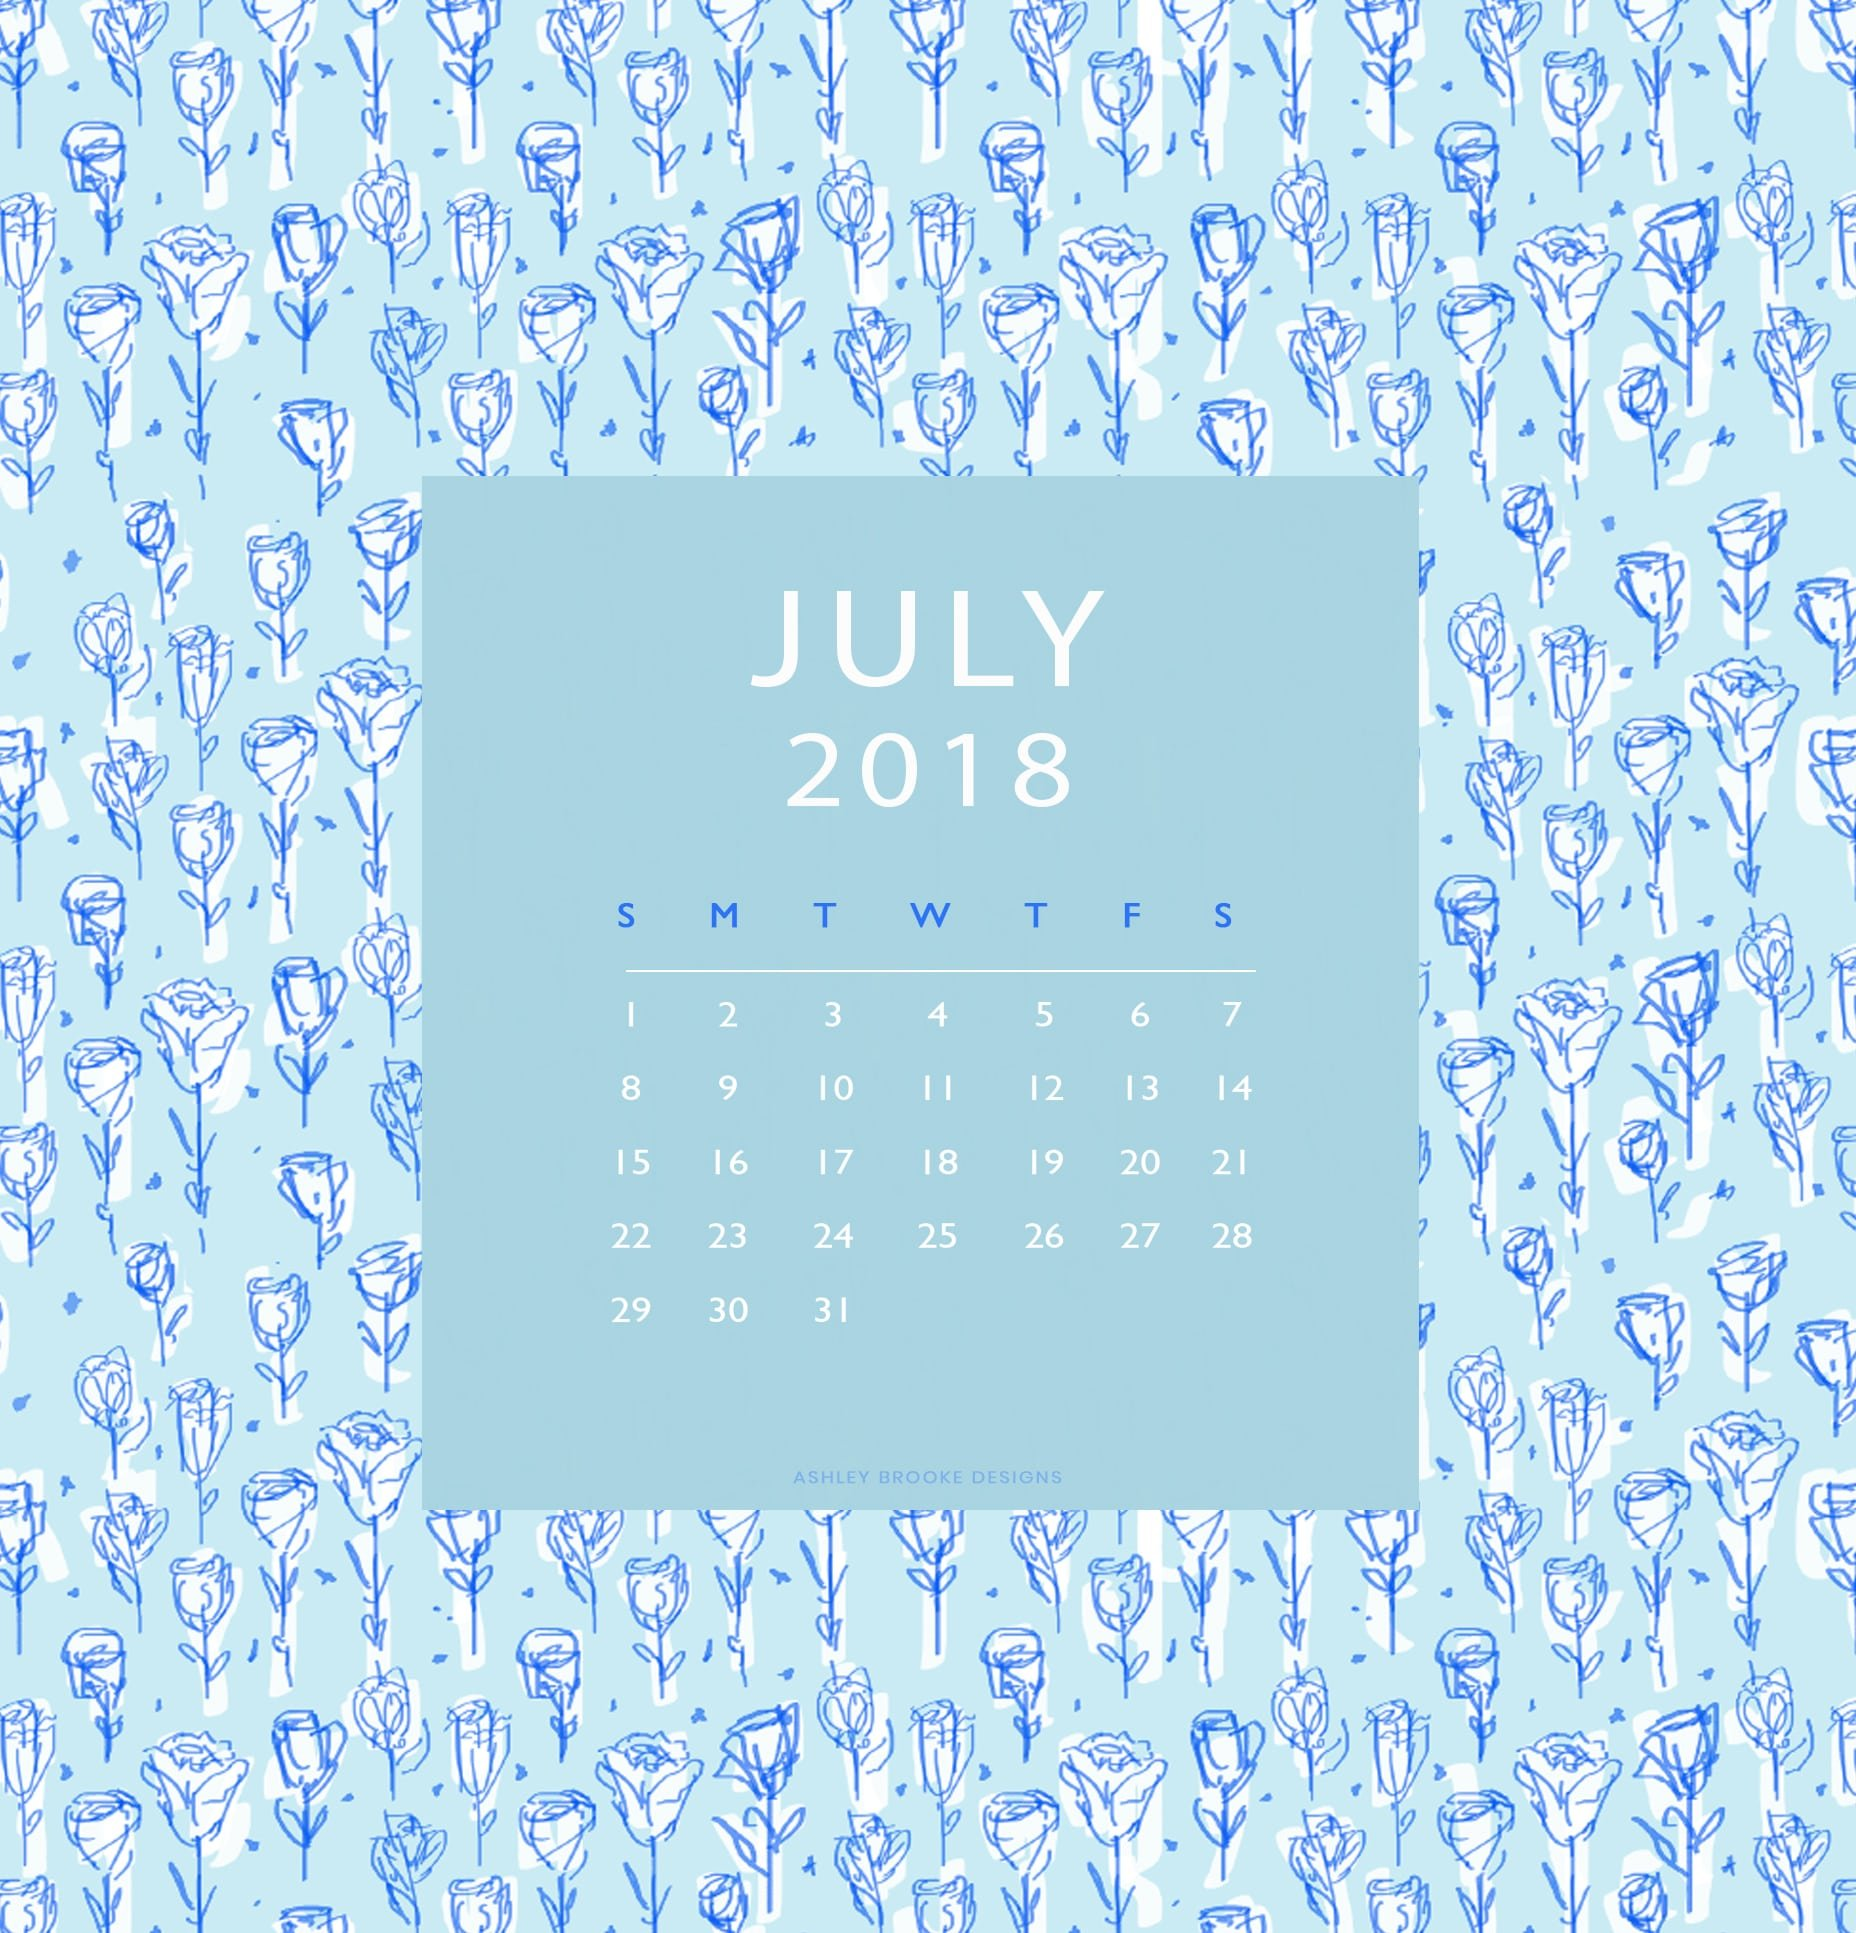 Free Calendar Download July 2018   www.ashleybrookedesigns.com